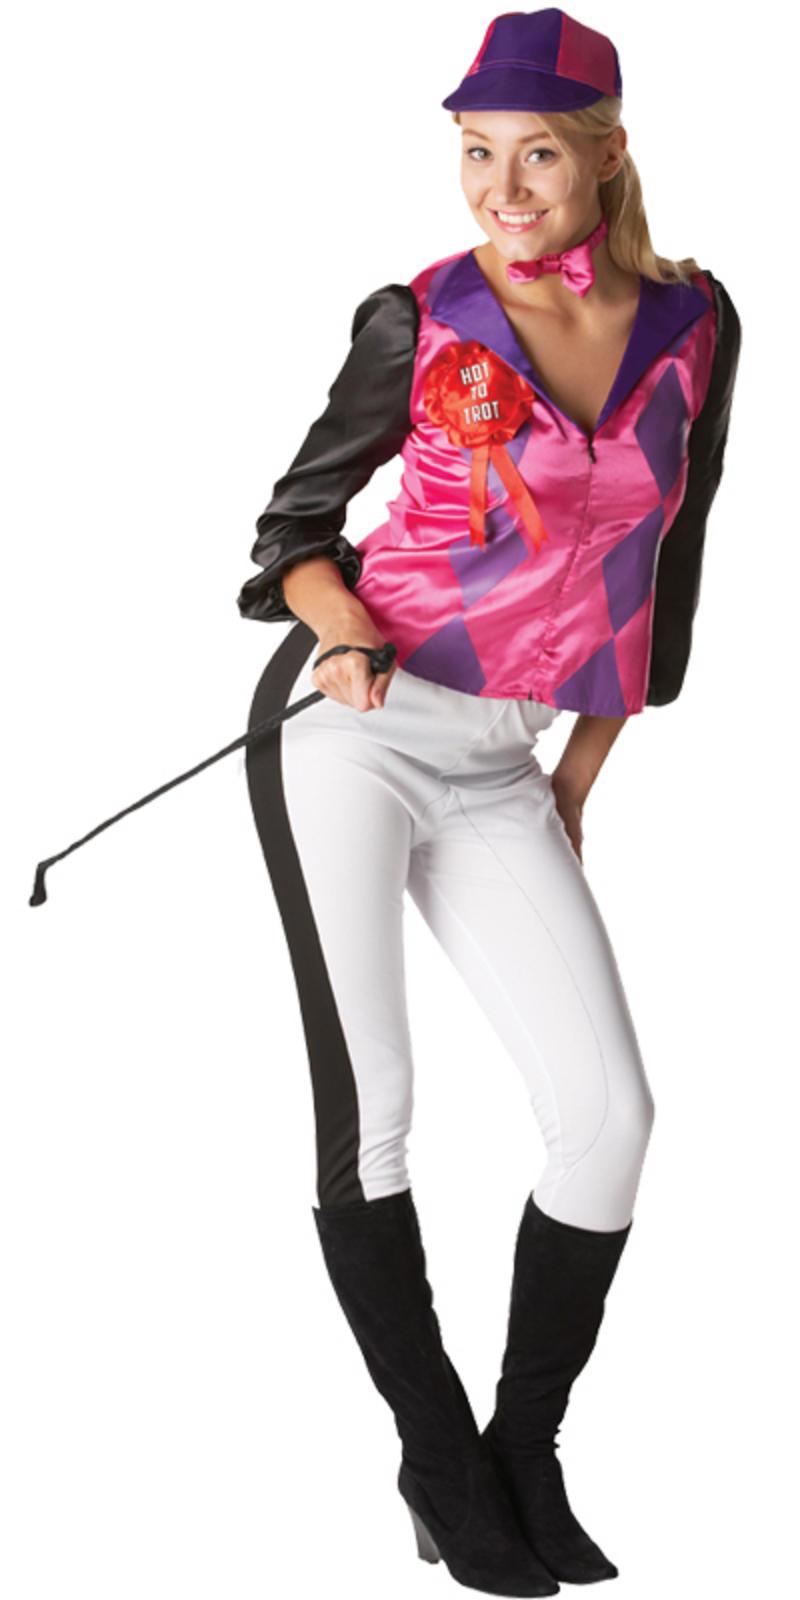 Adult Female Jockey Horse Riding Fancy Dress Up Party Halloween